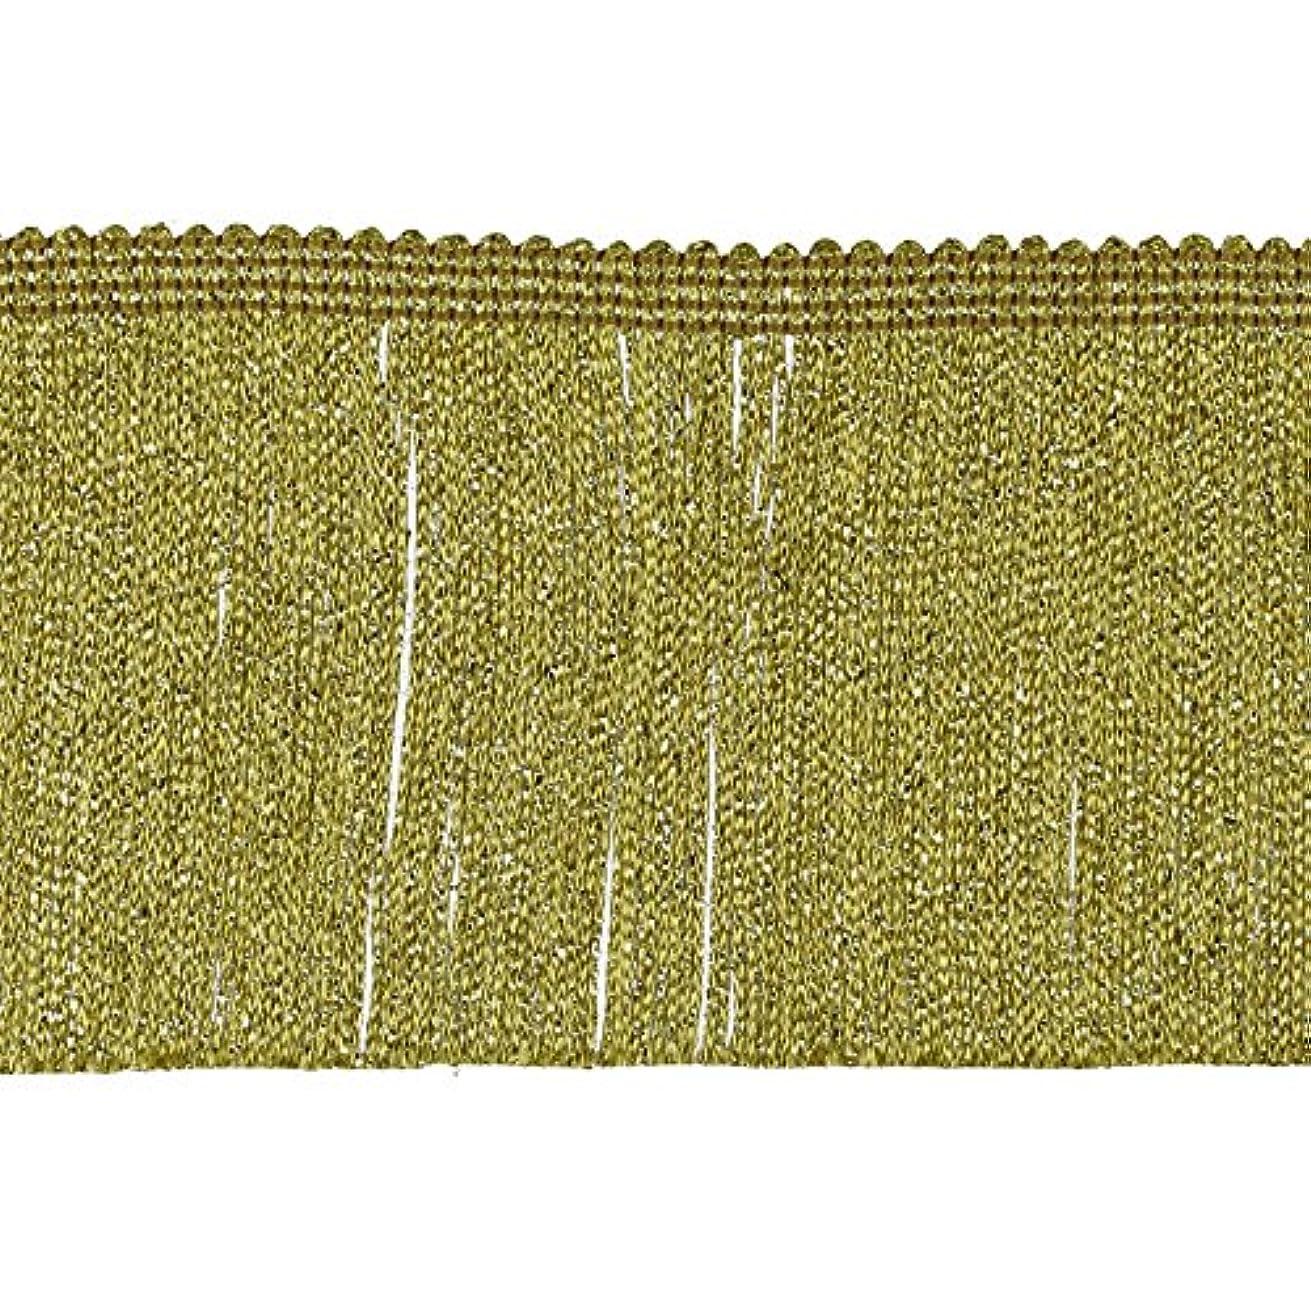 Chainette Fringe 4 Inch Width (10CM), 9-Yard Length, 100% Rayon, Metallic Gold